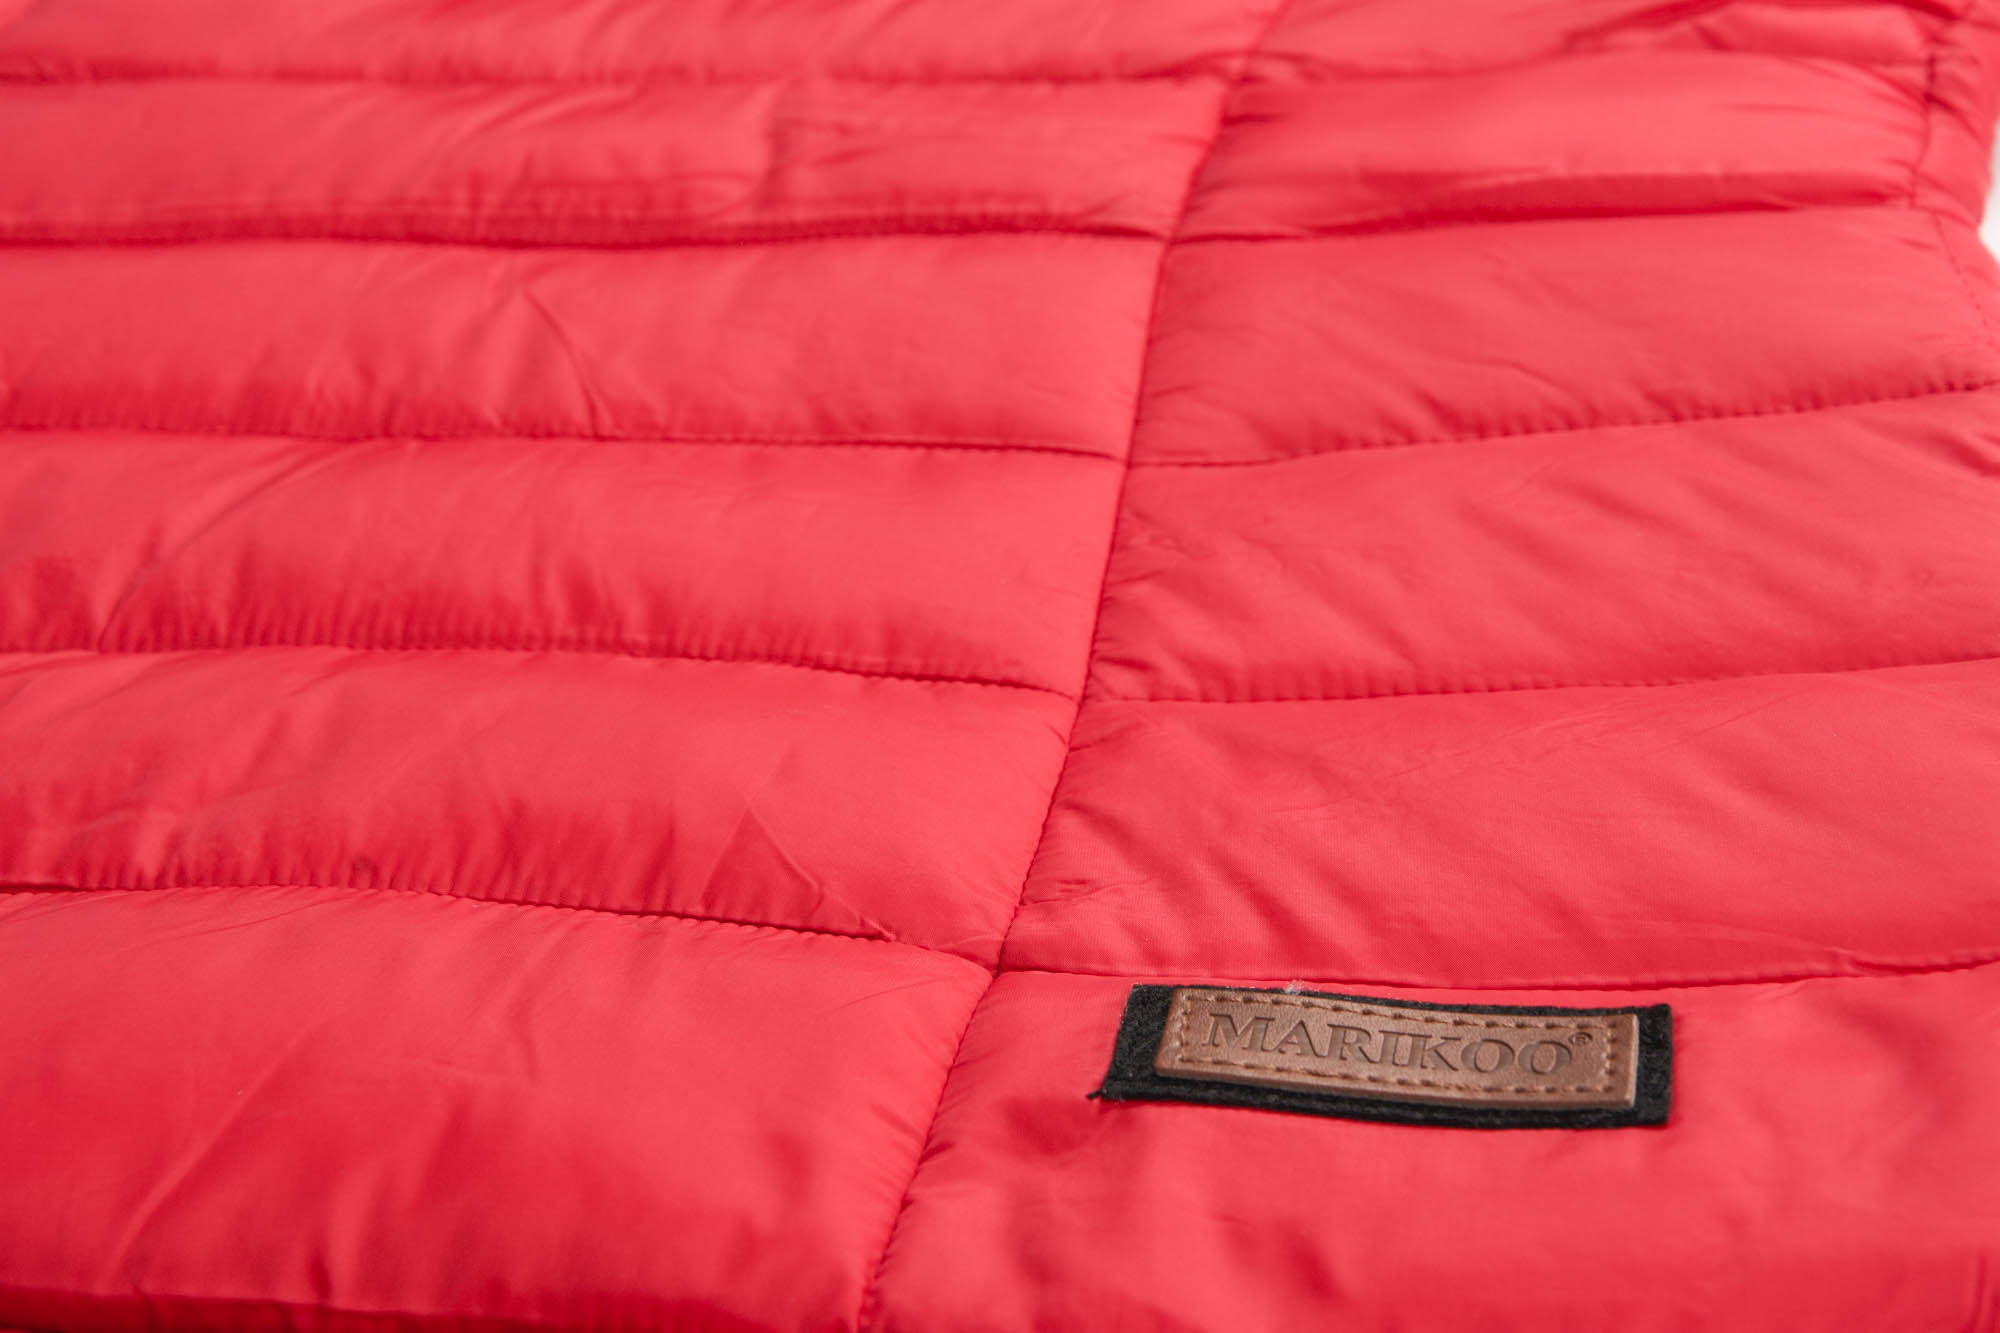 Marikoo-Lucy-Damen-Jacke-Steppjacke-Ubergangsjacke-gesteppt-Stepp-NEU-B651 Indexbild 22